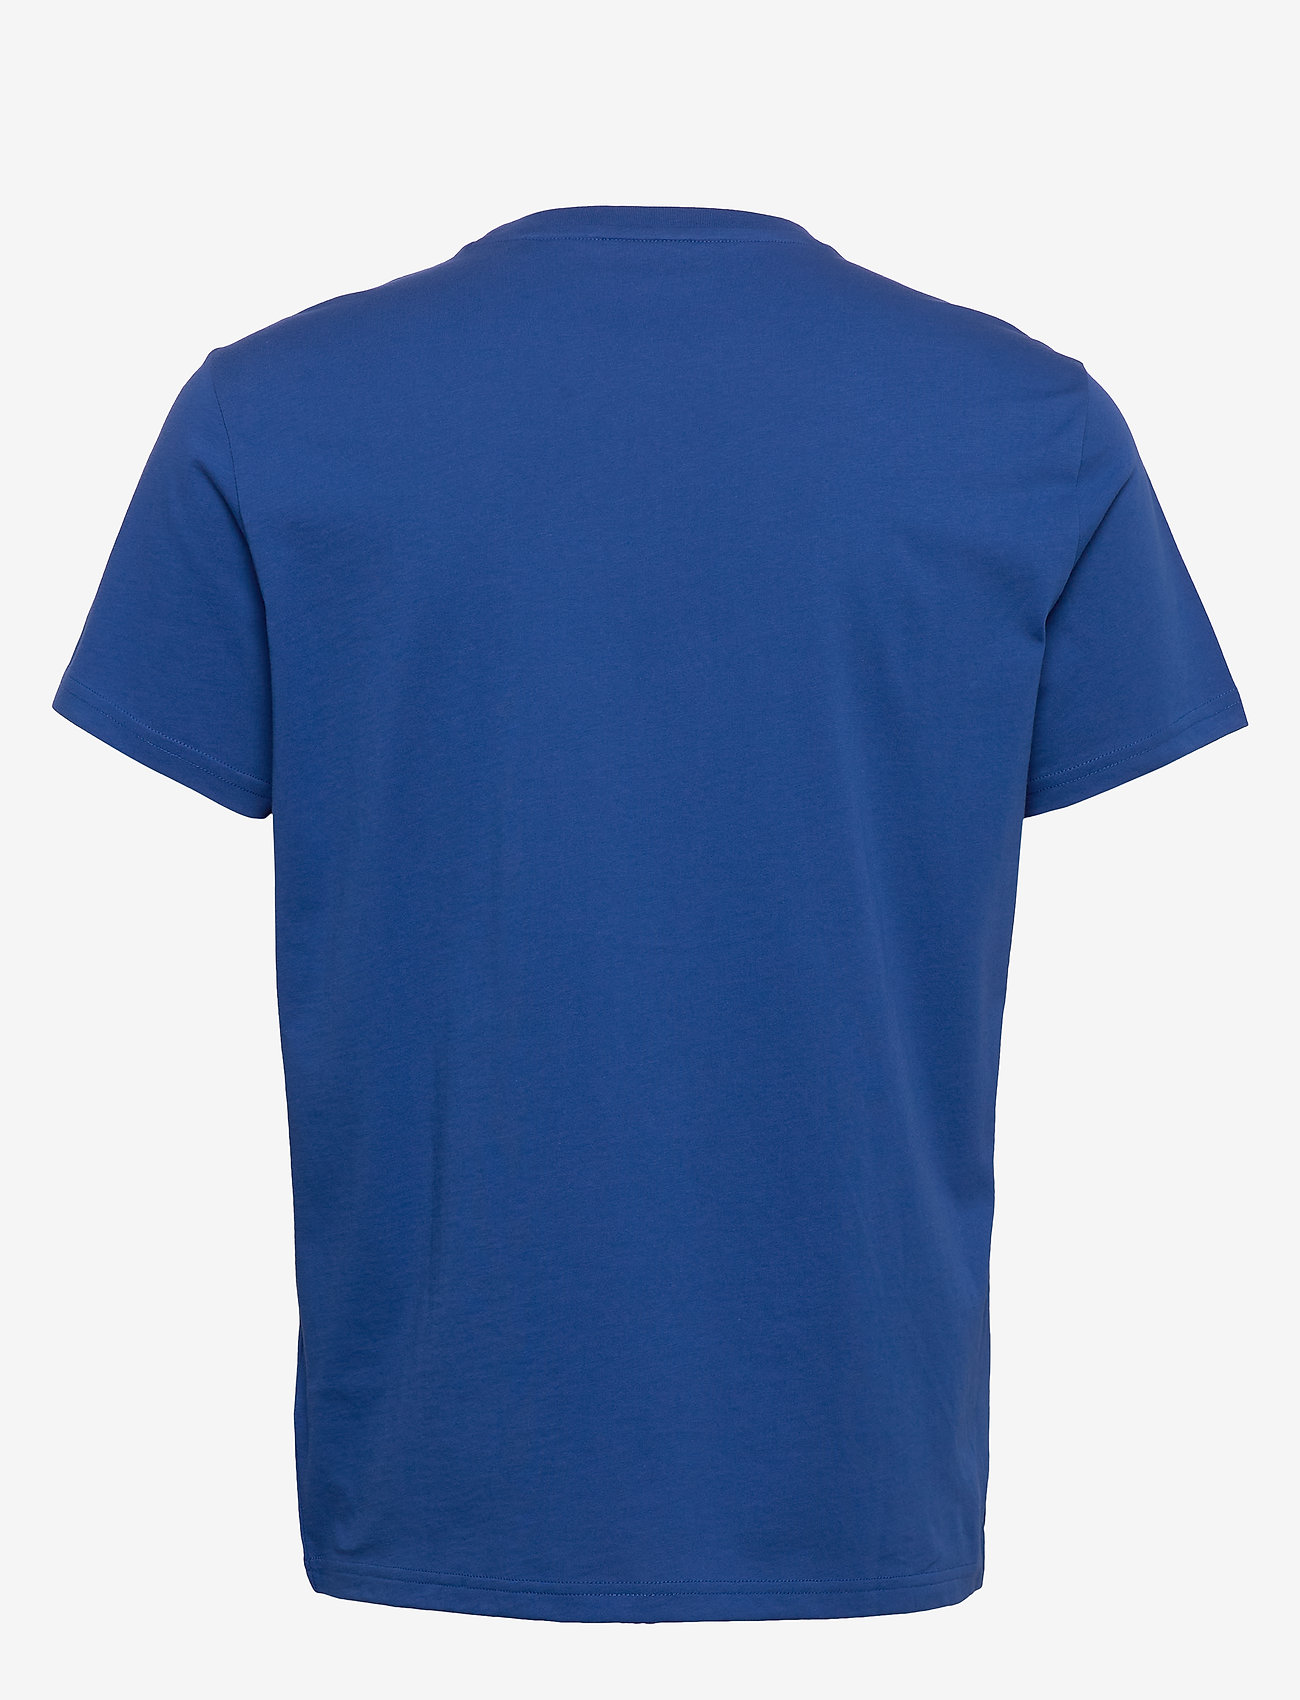 GANT - D1. COLOR LOCK UP SS T-SHIRT - short-sleeved t-shirts - crisp blue - 1